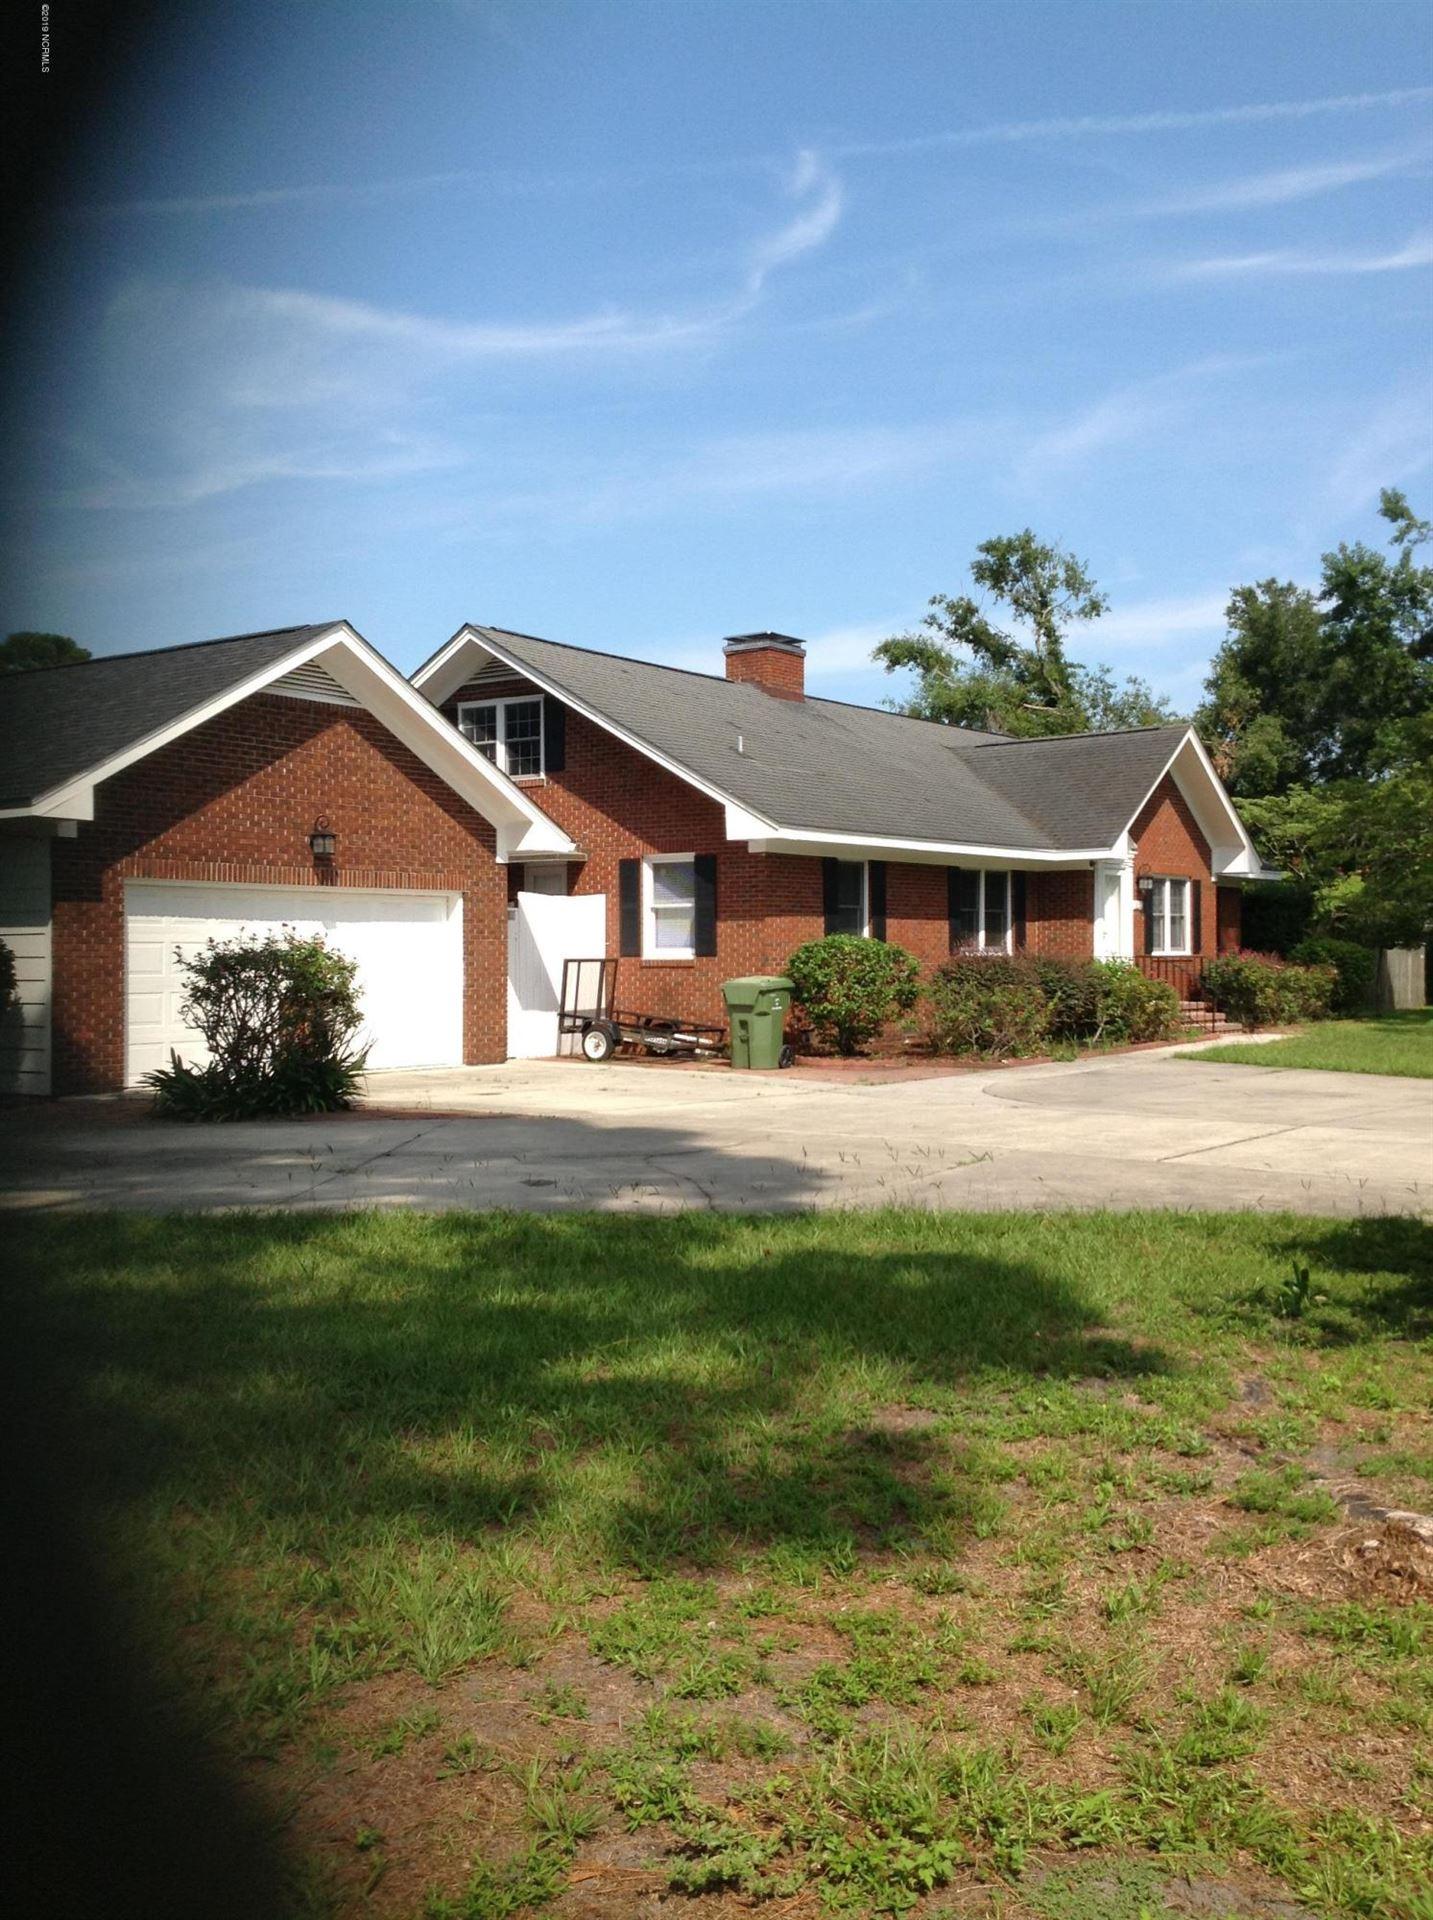 Photo of 3811 Edgewood Road, Wilmington, NC 28403 (MLS # 100277477)